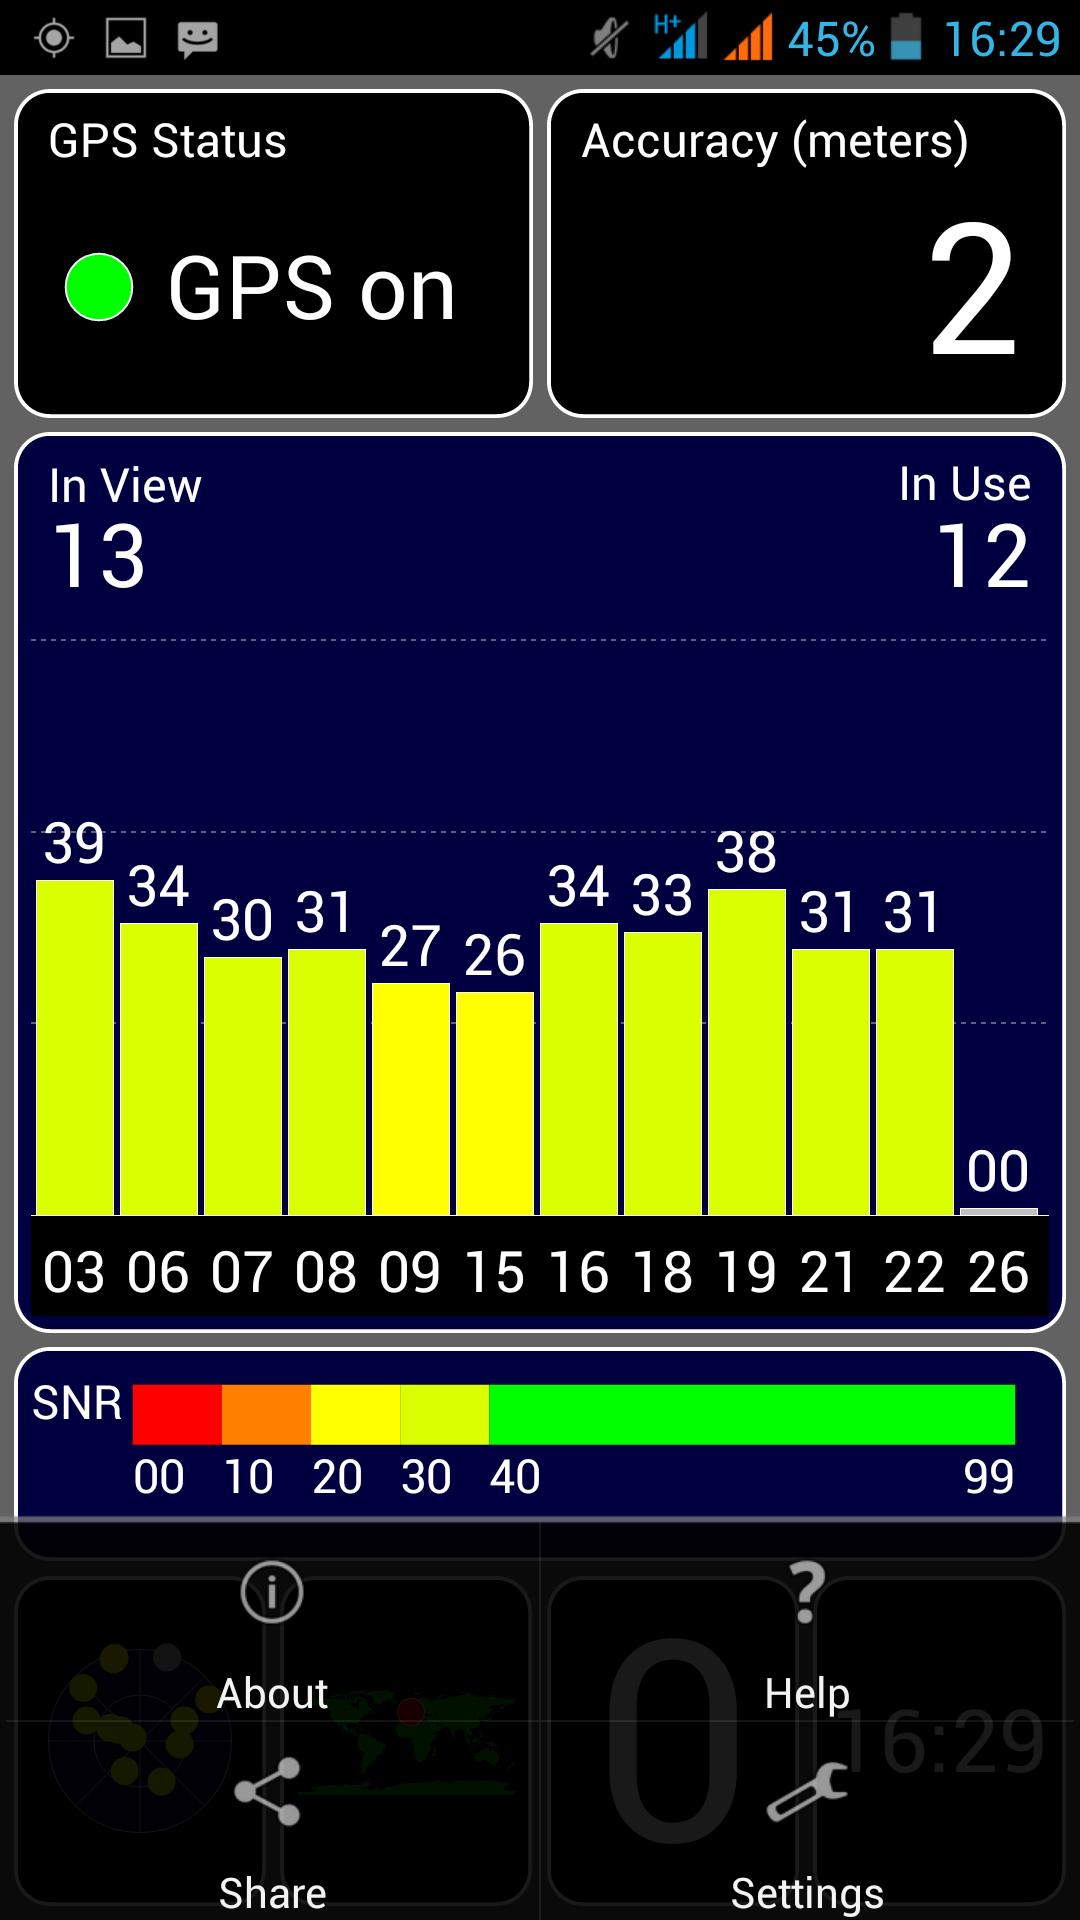 Screenshot_2013-09-06-16-29-03.png